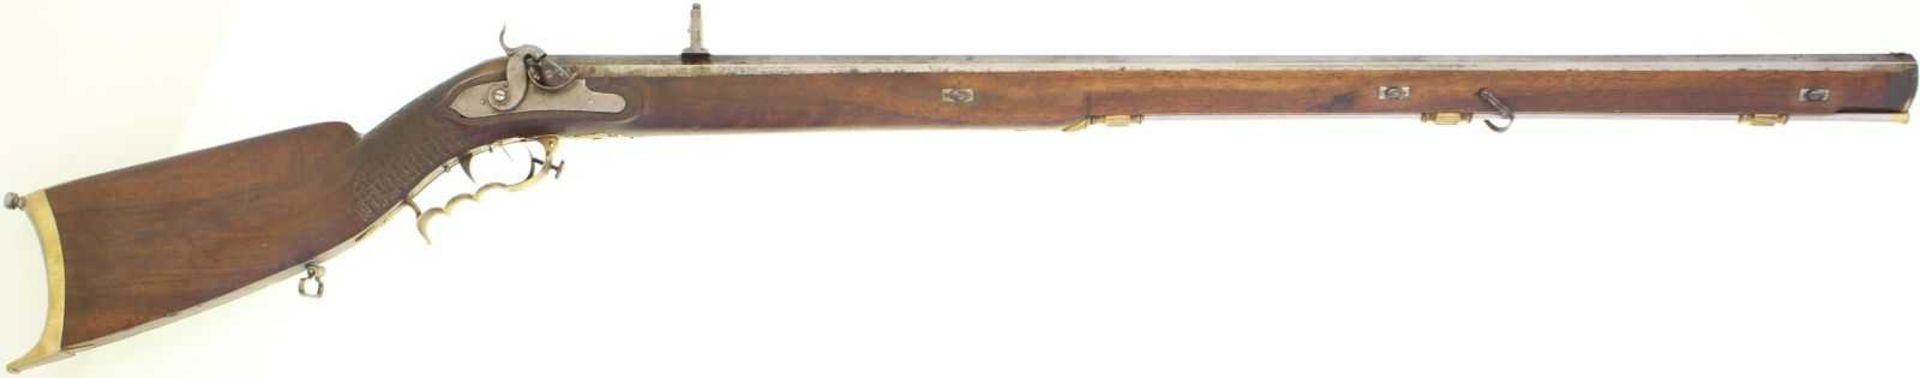 Standstutzer 1820/40, Kal. 16mm Perkussion aus Steinschloss aptiert, Achtkantlauf gezogen, LL 960mm.